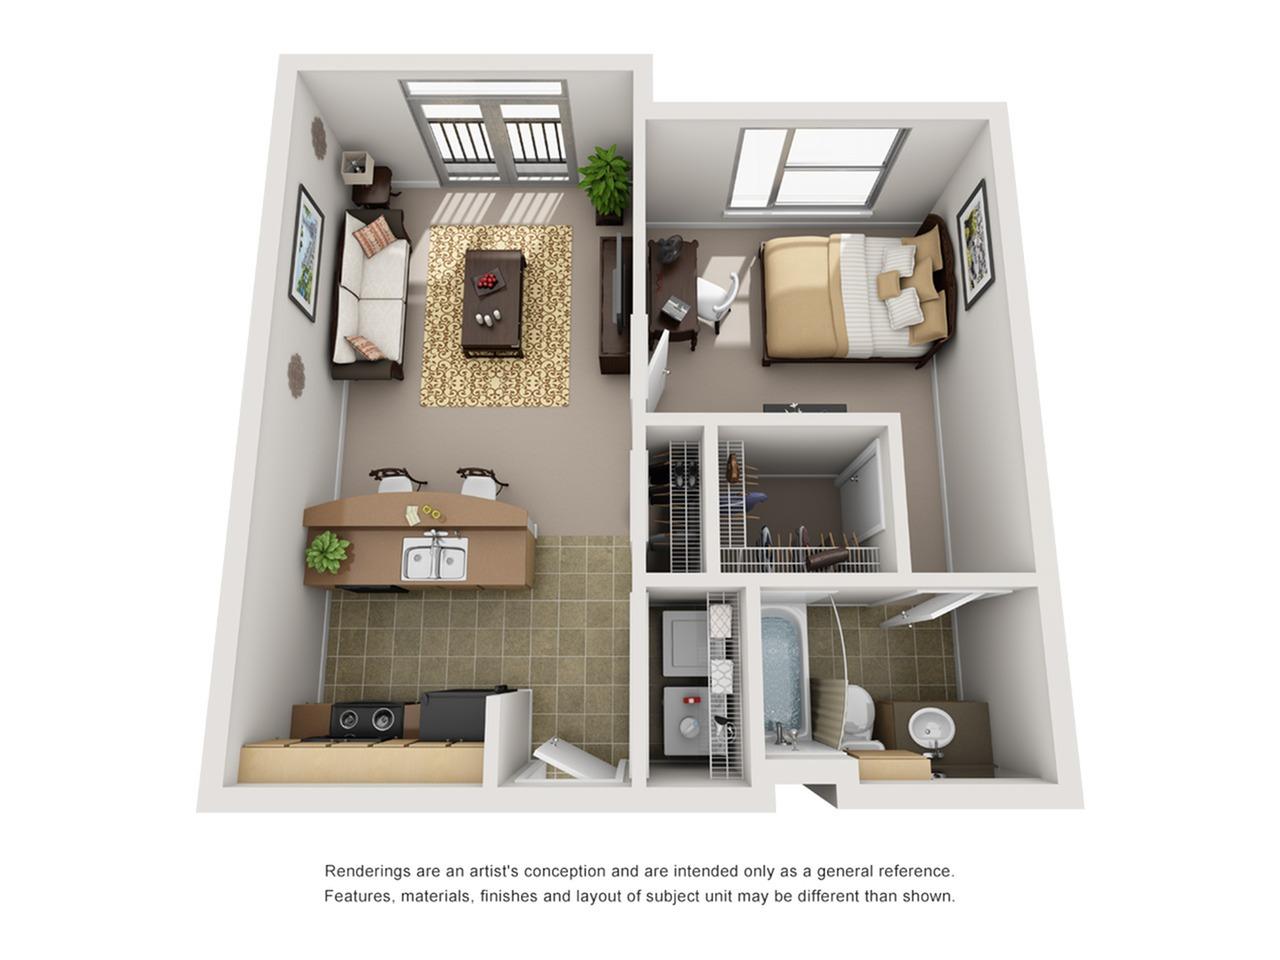 1 bedroom apartment in baton rouge